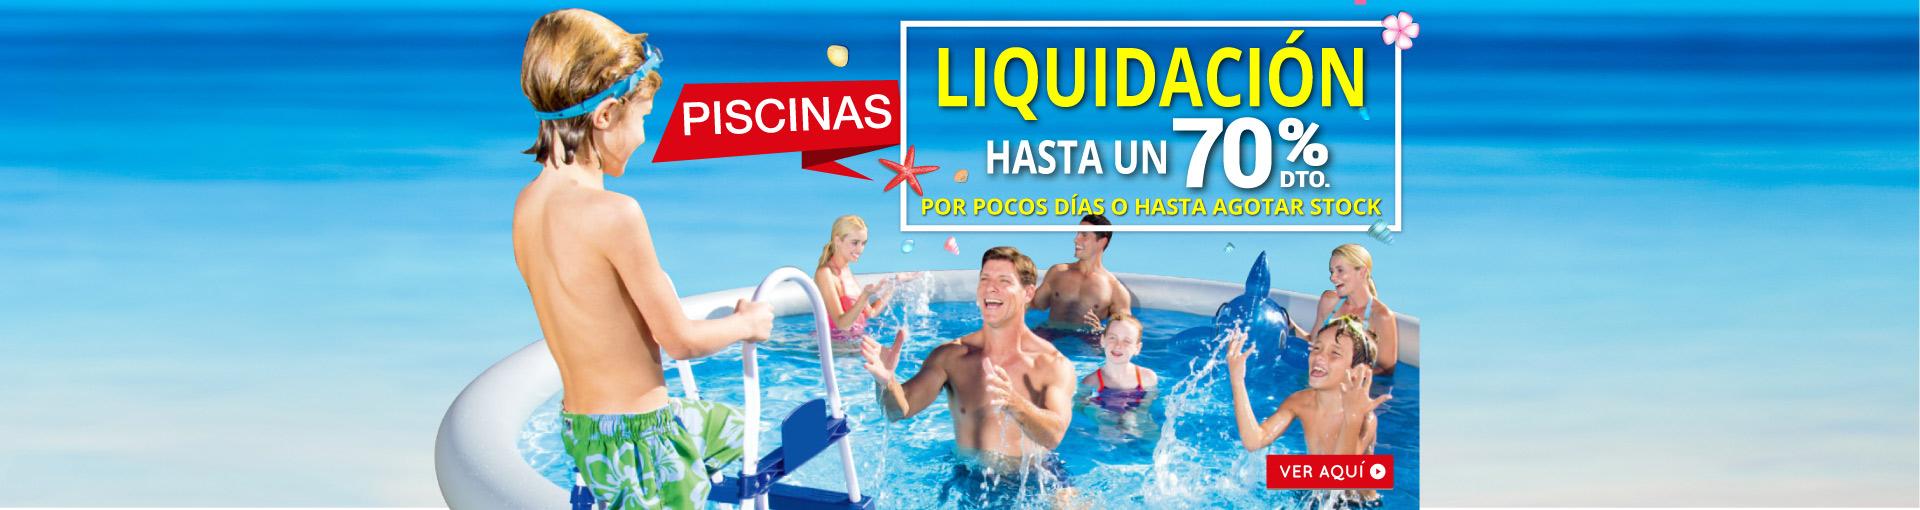 h-piscinas-1920x510-x